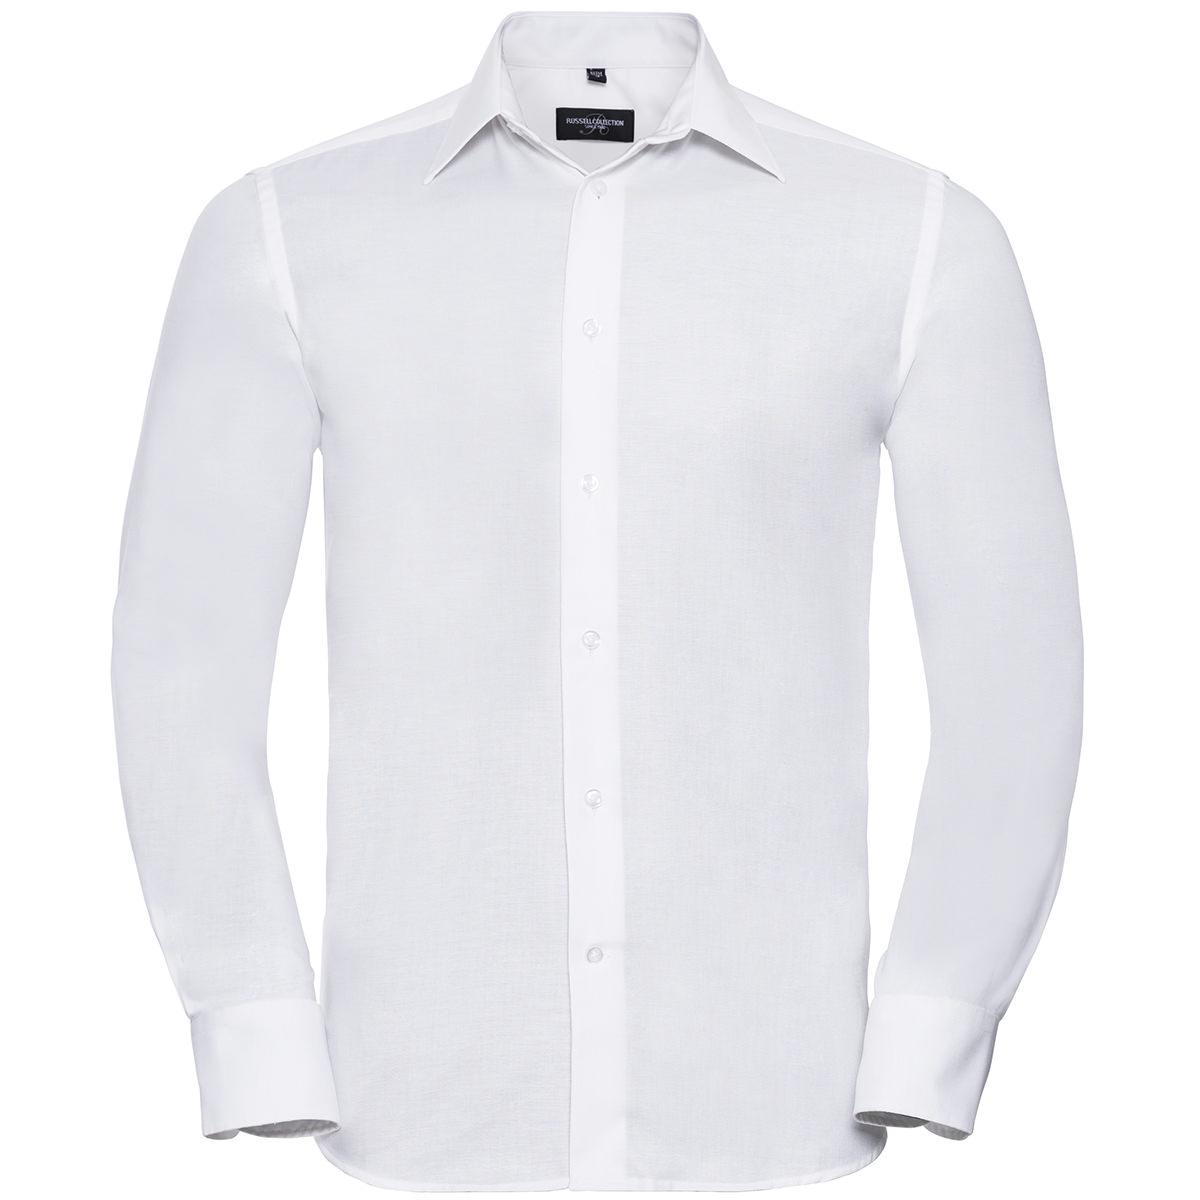 Tailliertes Oxford Hemd - Langarm